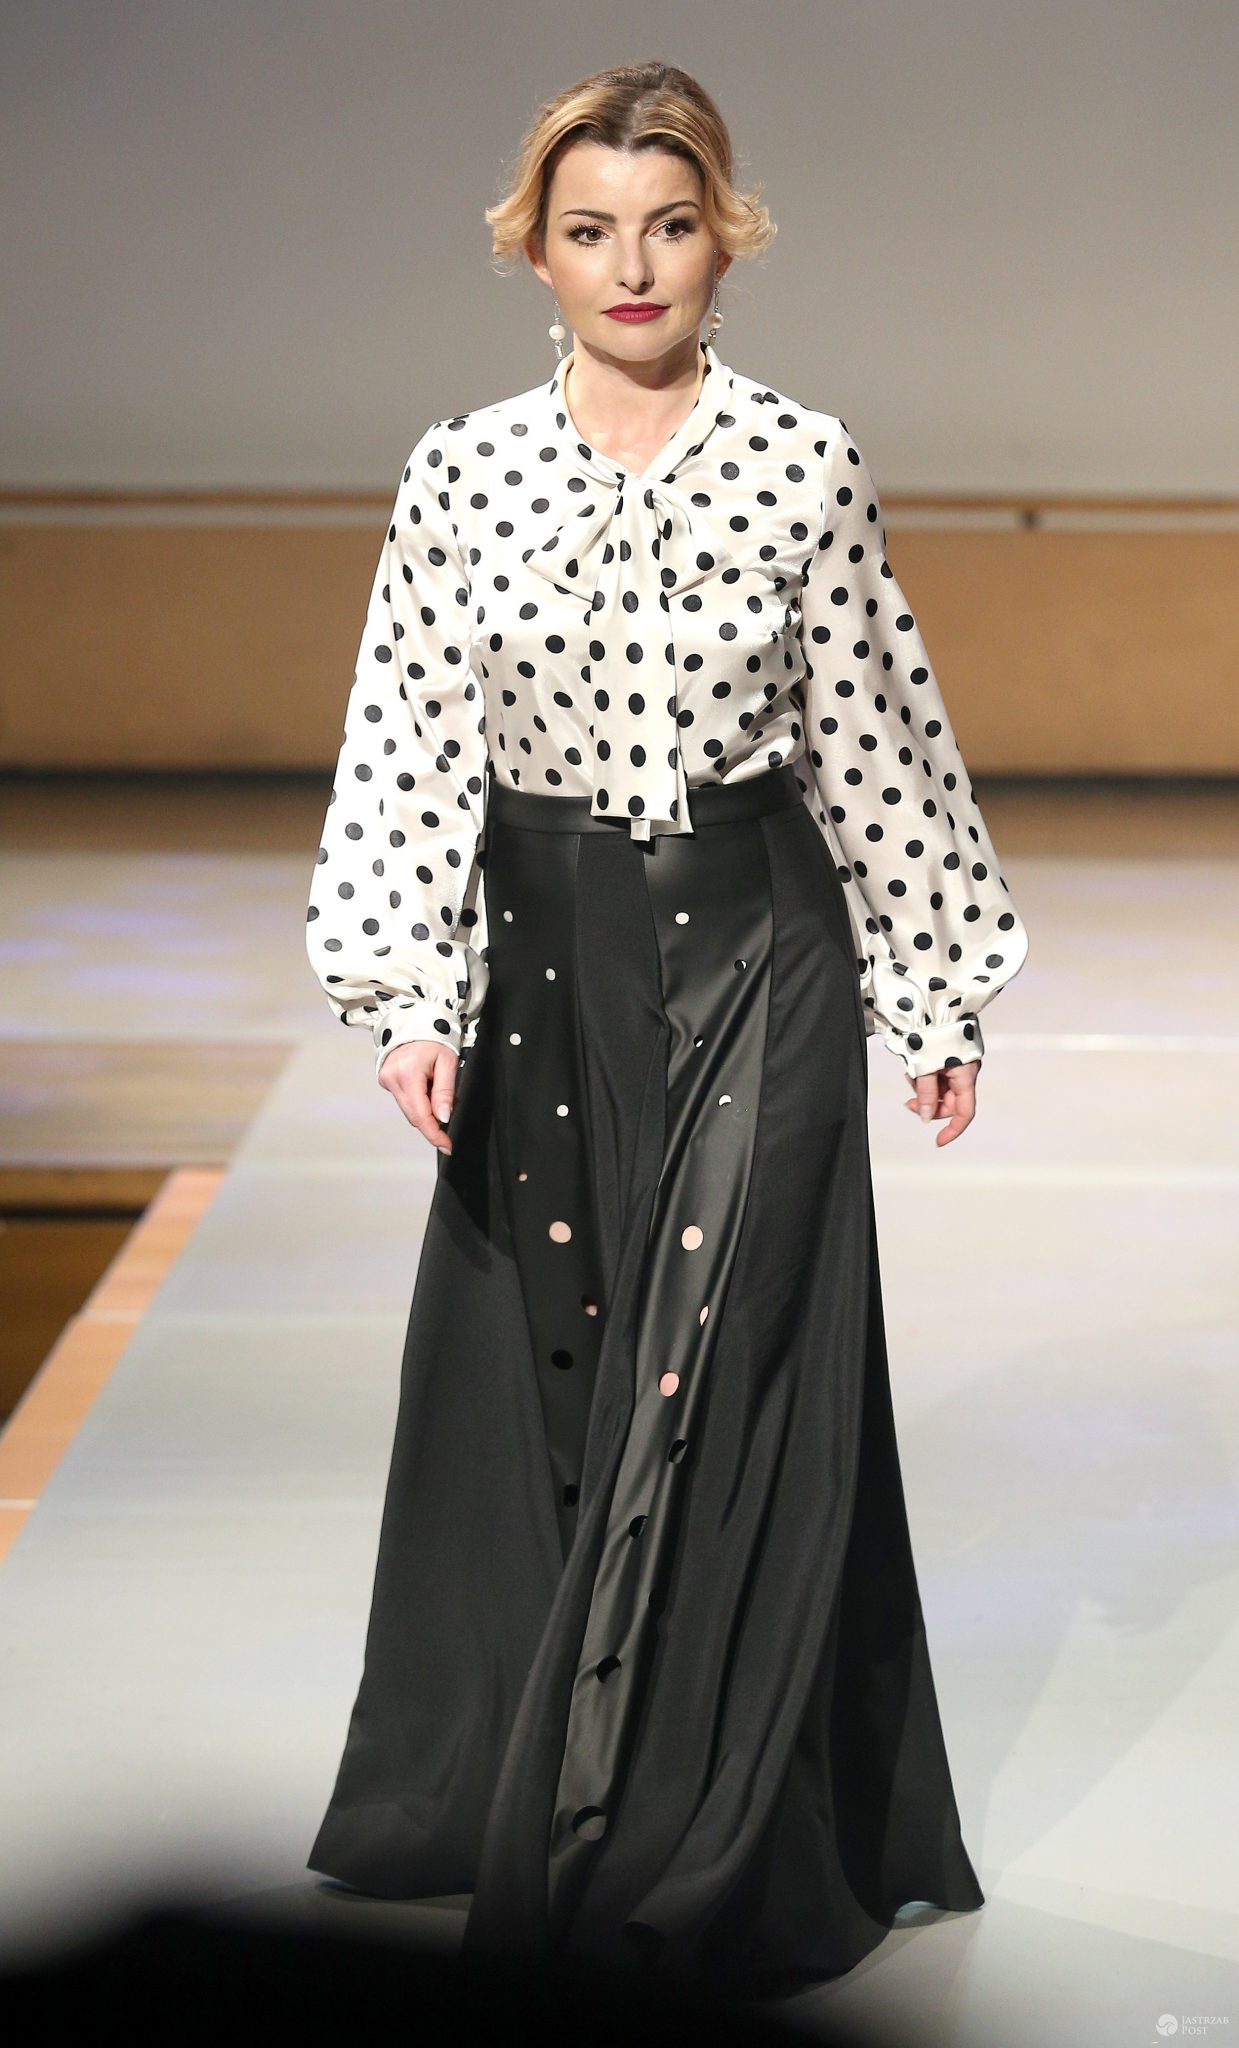 Beata Chmielowska Olech - Cracow Fashion Day